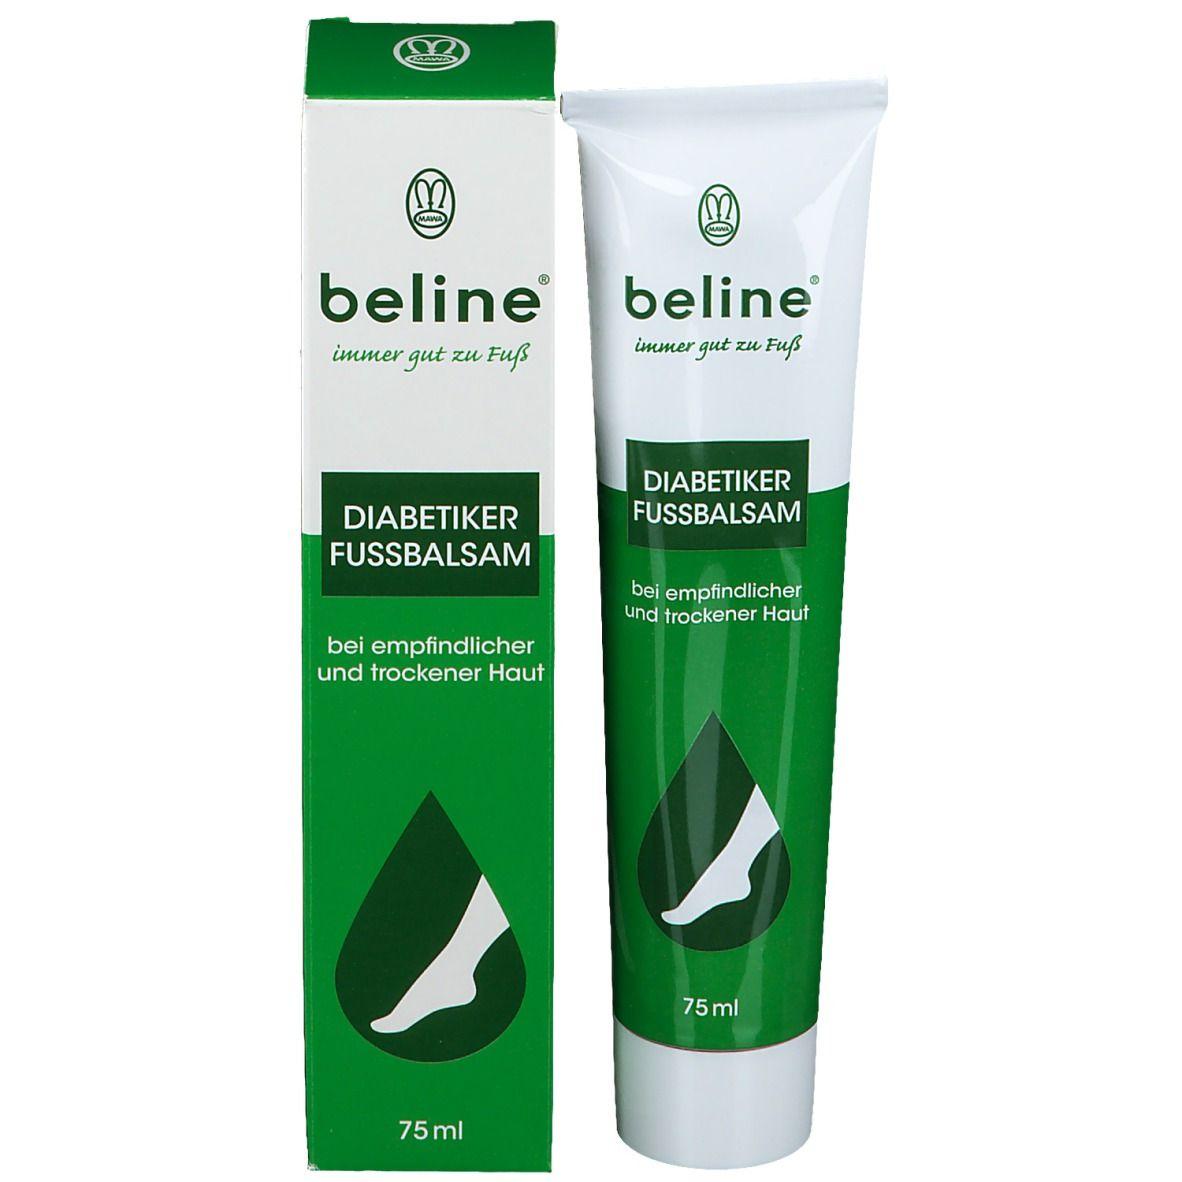 Beline Schrunden-Fußbalsam | diabetes.moglebaum.com